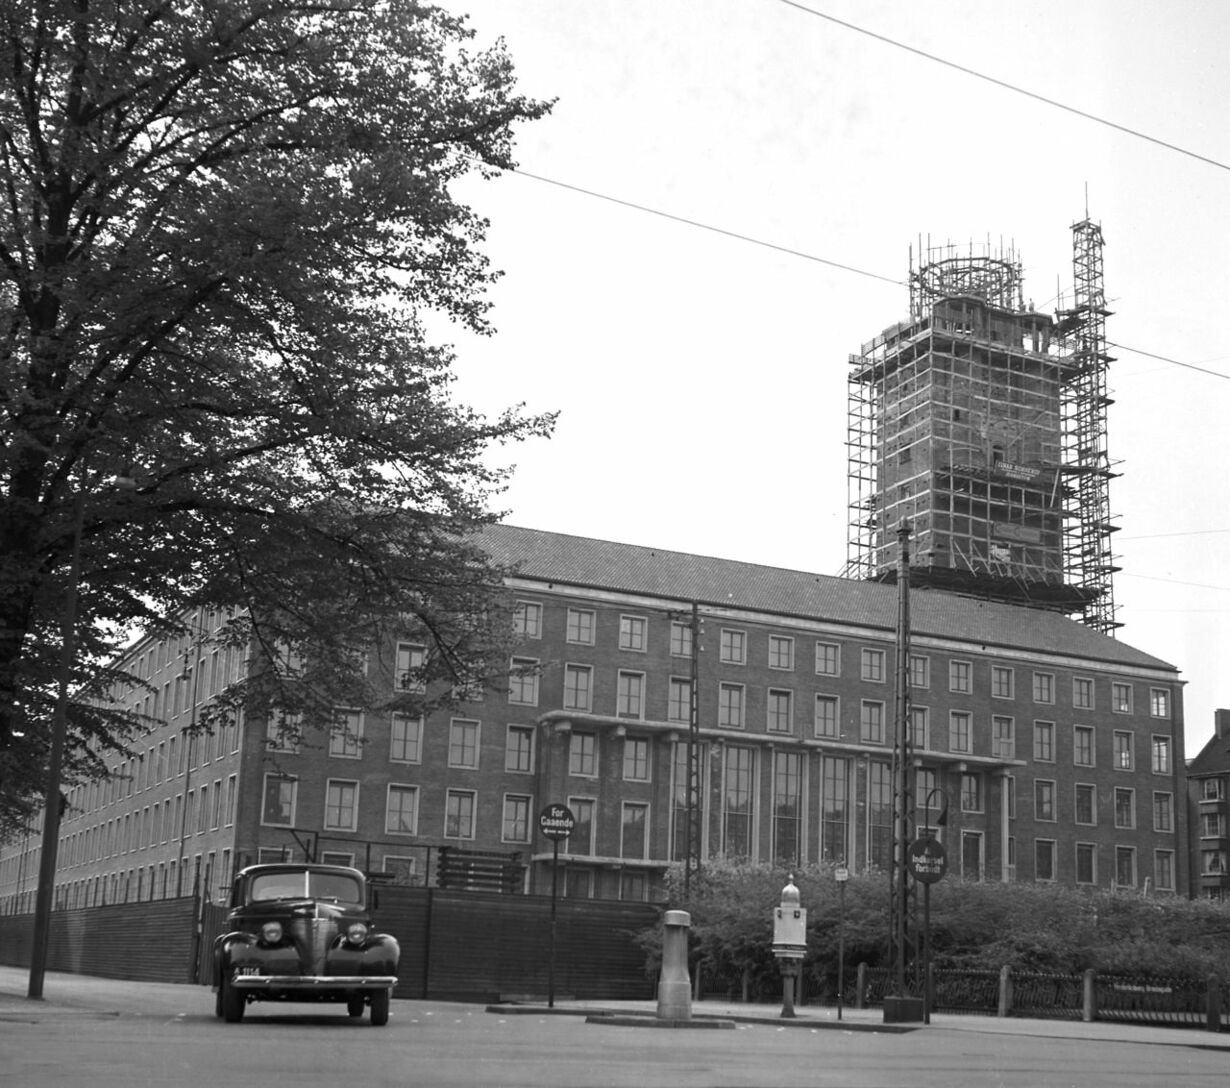 1952 frederiksberg rådhus dkdengang